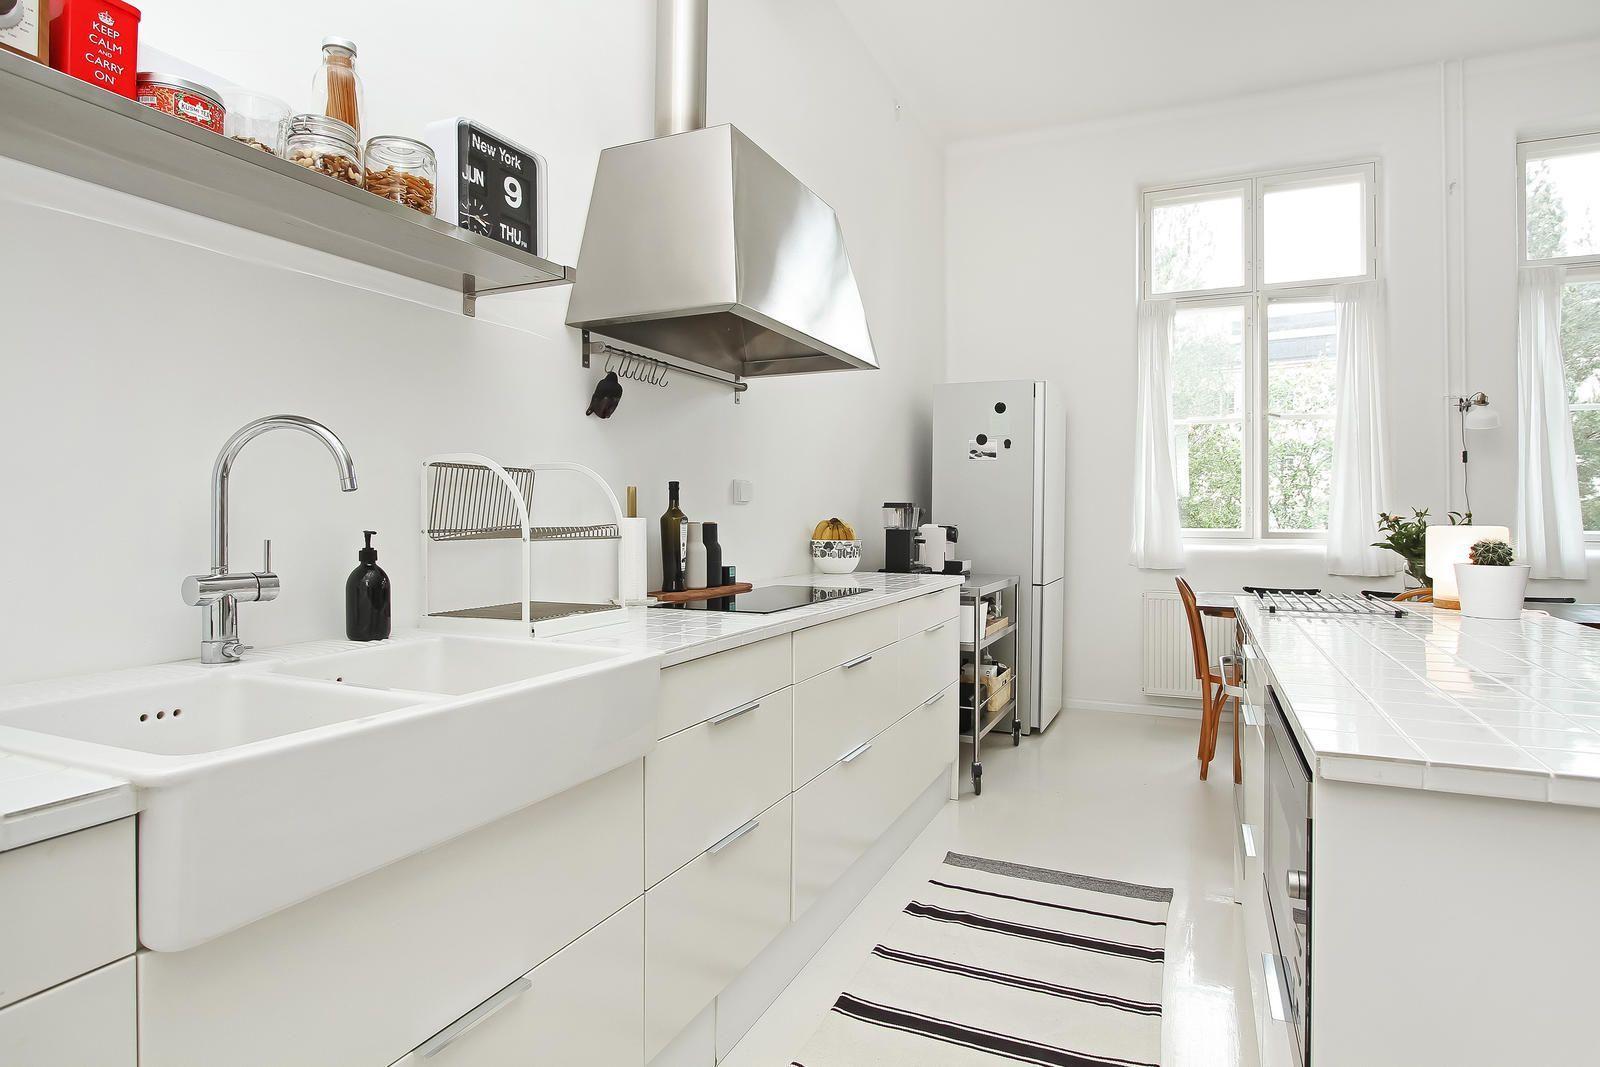 Laadukas, remontoitu keittiö saarekkeella  Etuovi com Ideat & vinkit